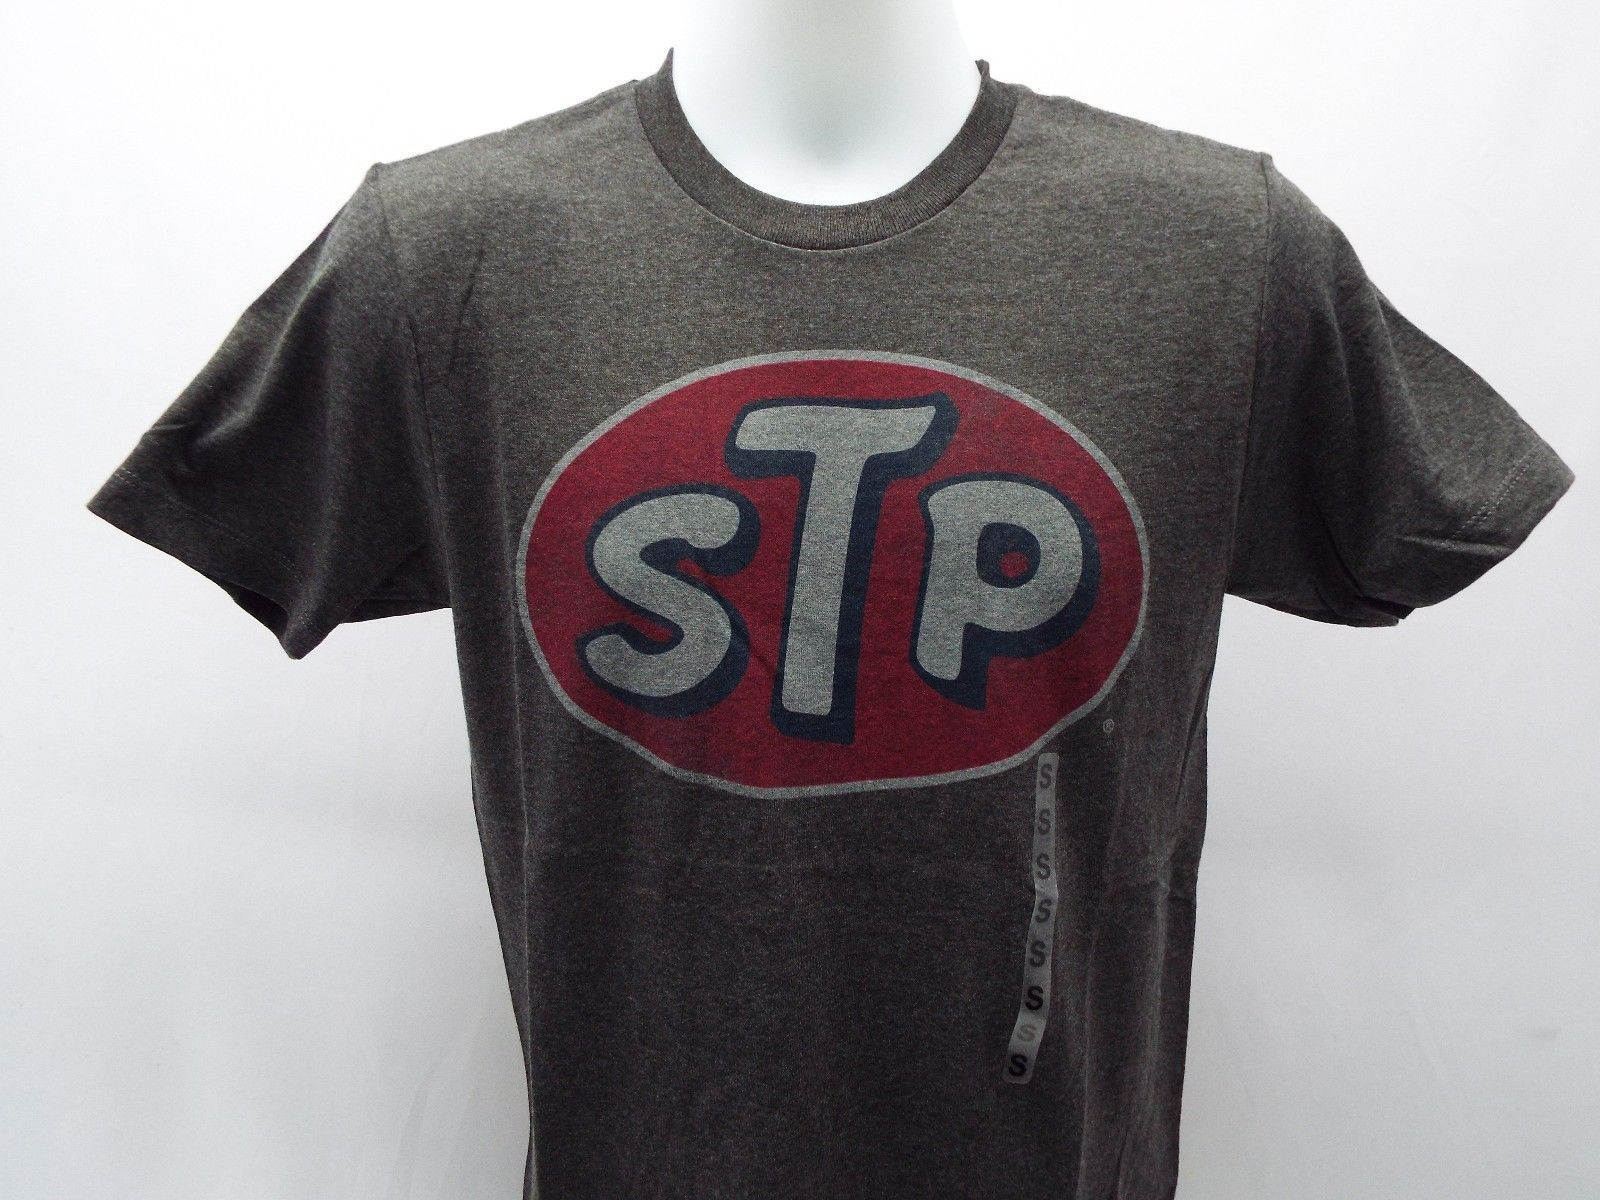 Stp Men S Sizes Thin T Shirt Original Vintage Logo